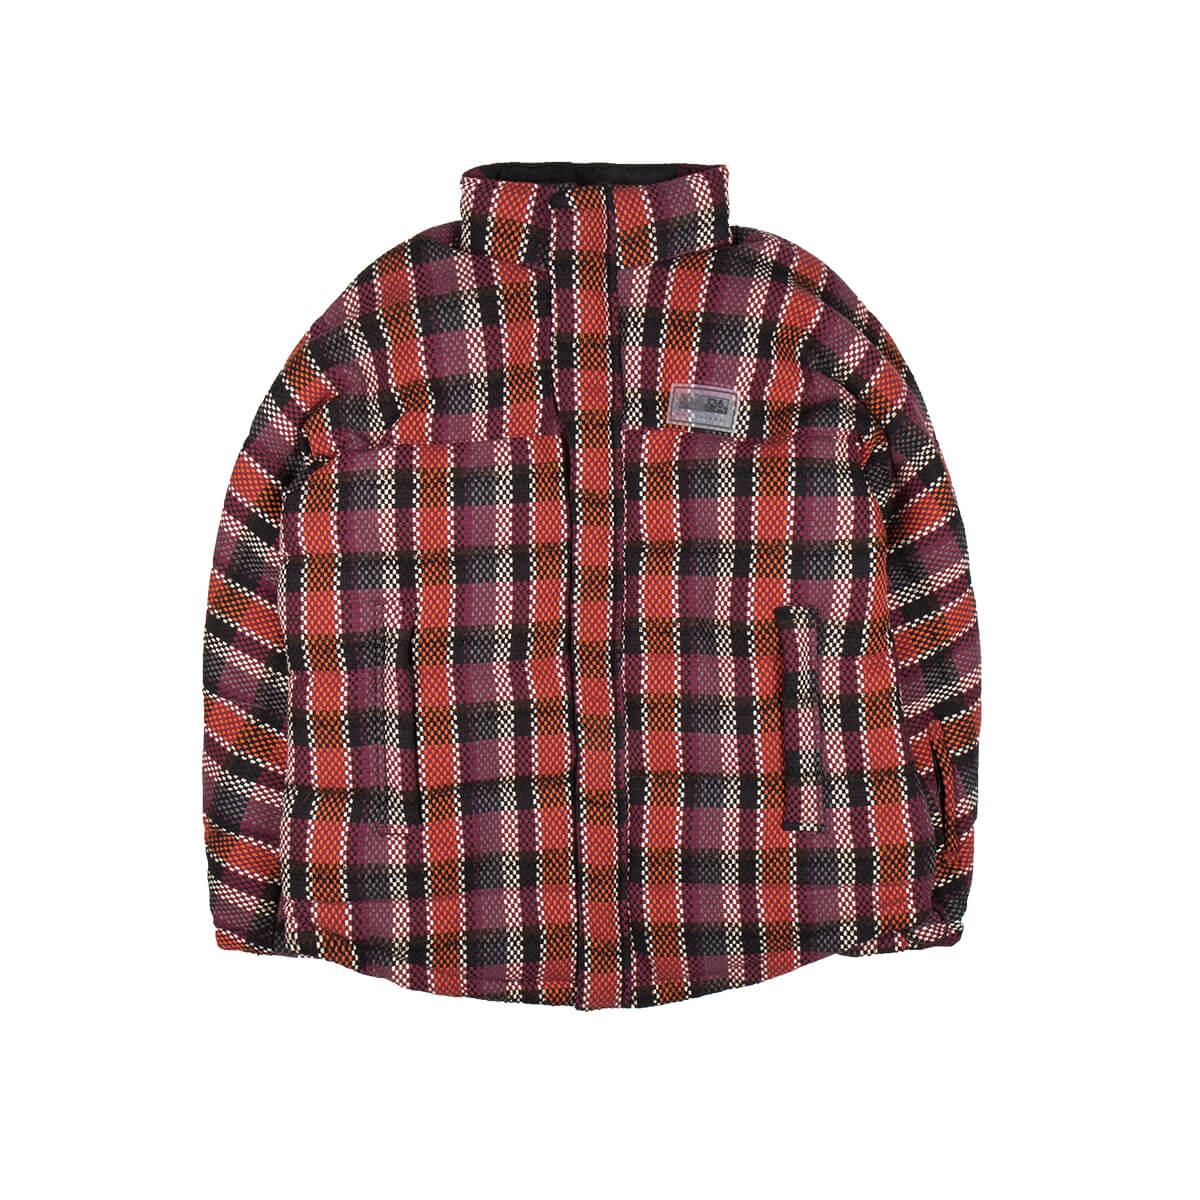 7398b0fbfad NAPA BY MARTINE ROSE A-Acho jacket Men Size L EU | Garmentory